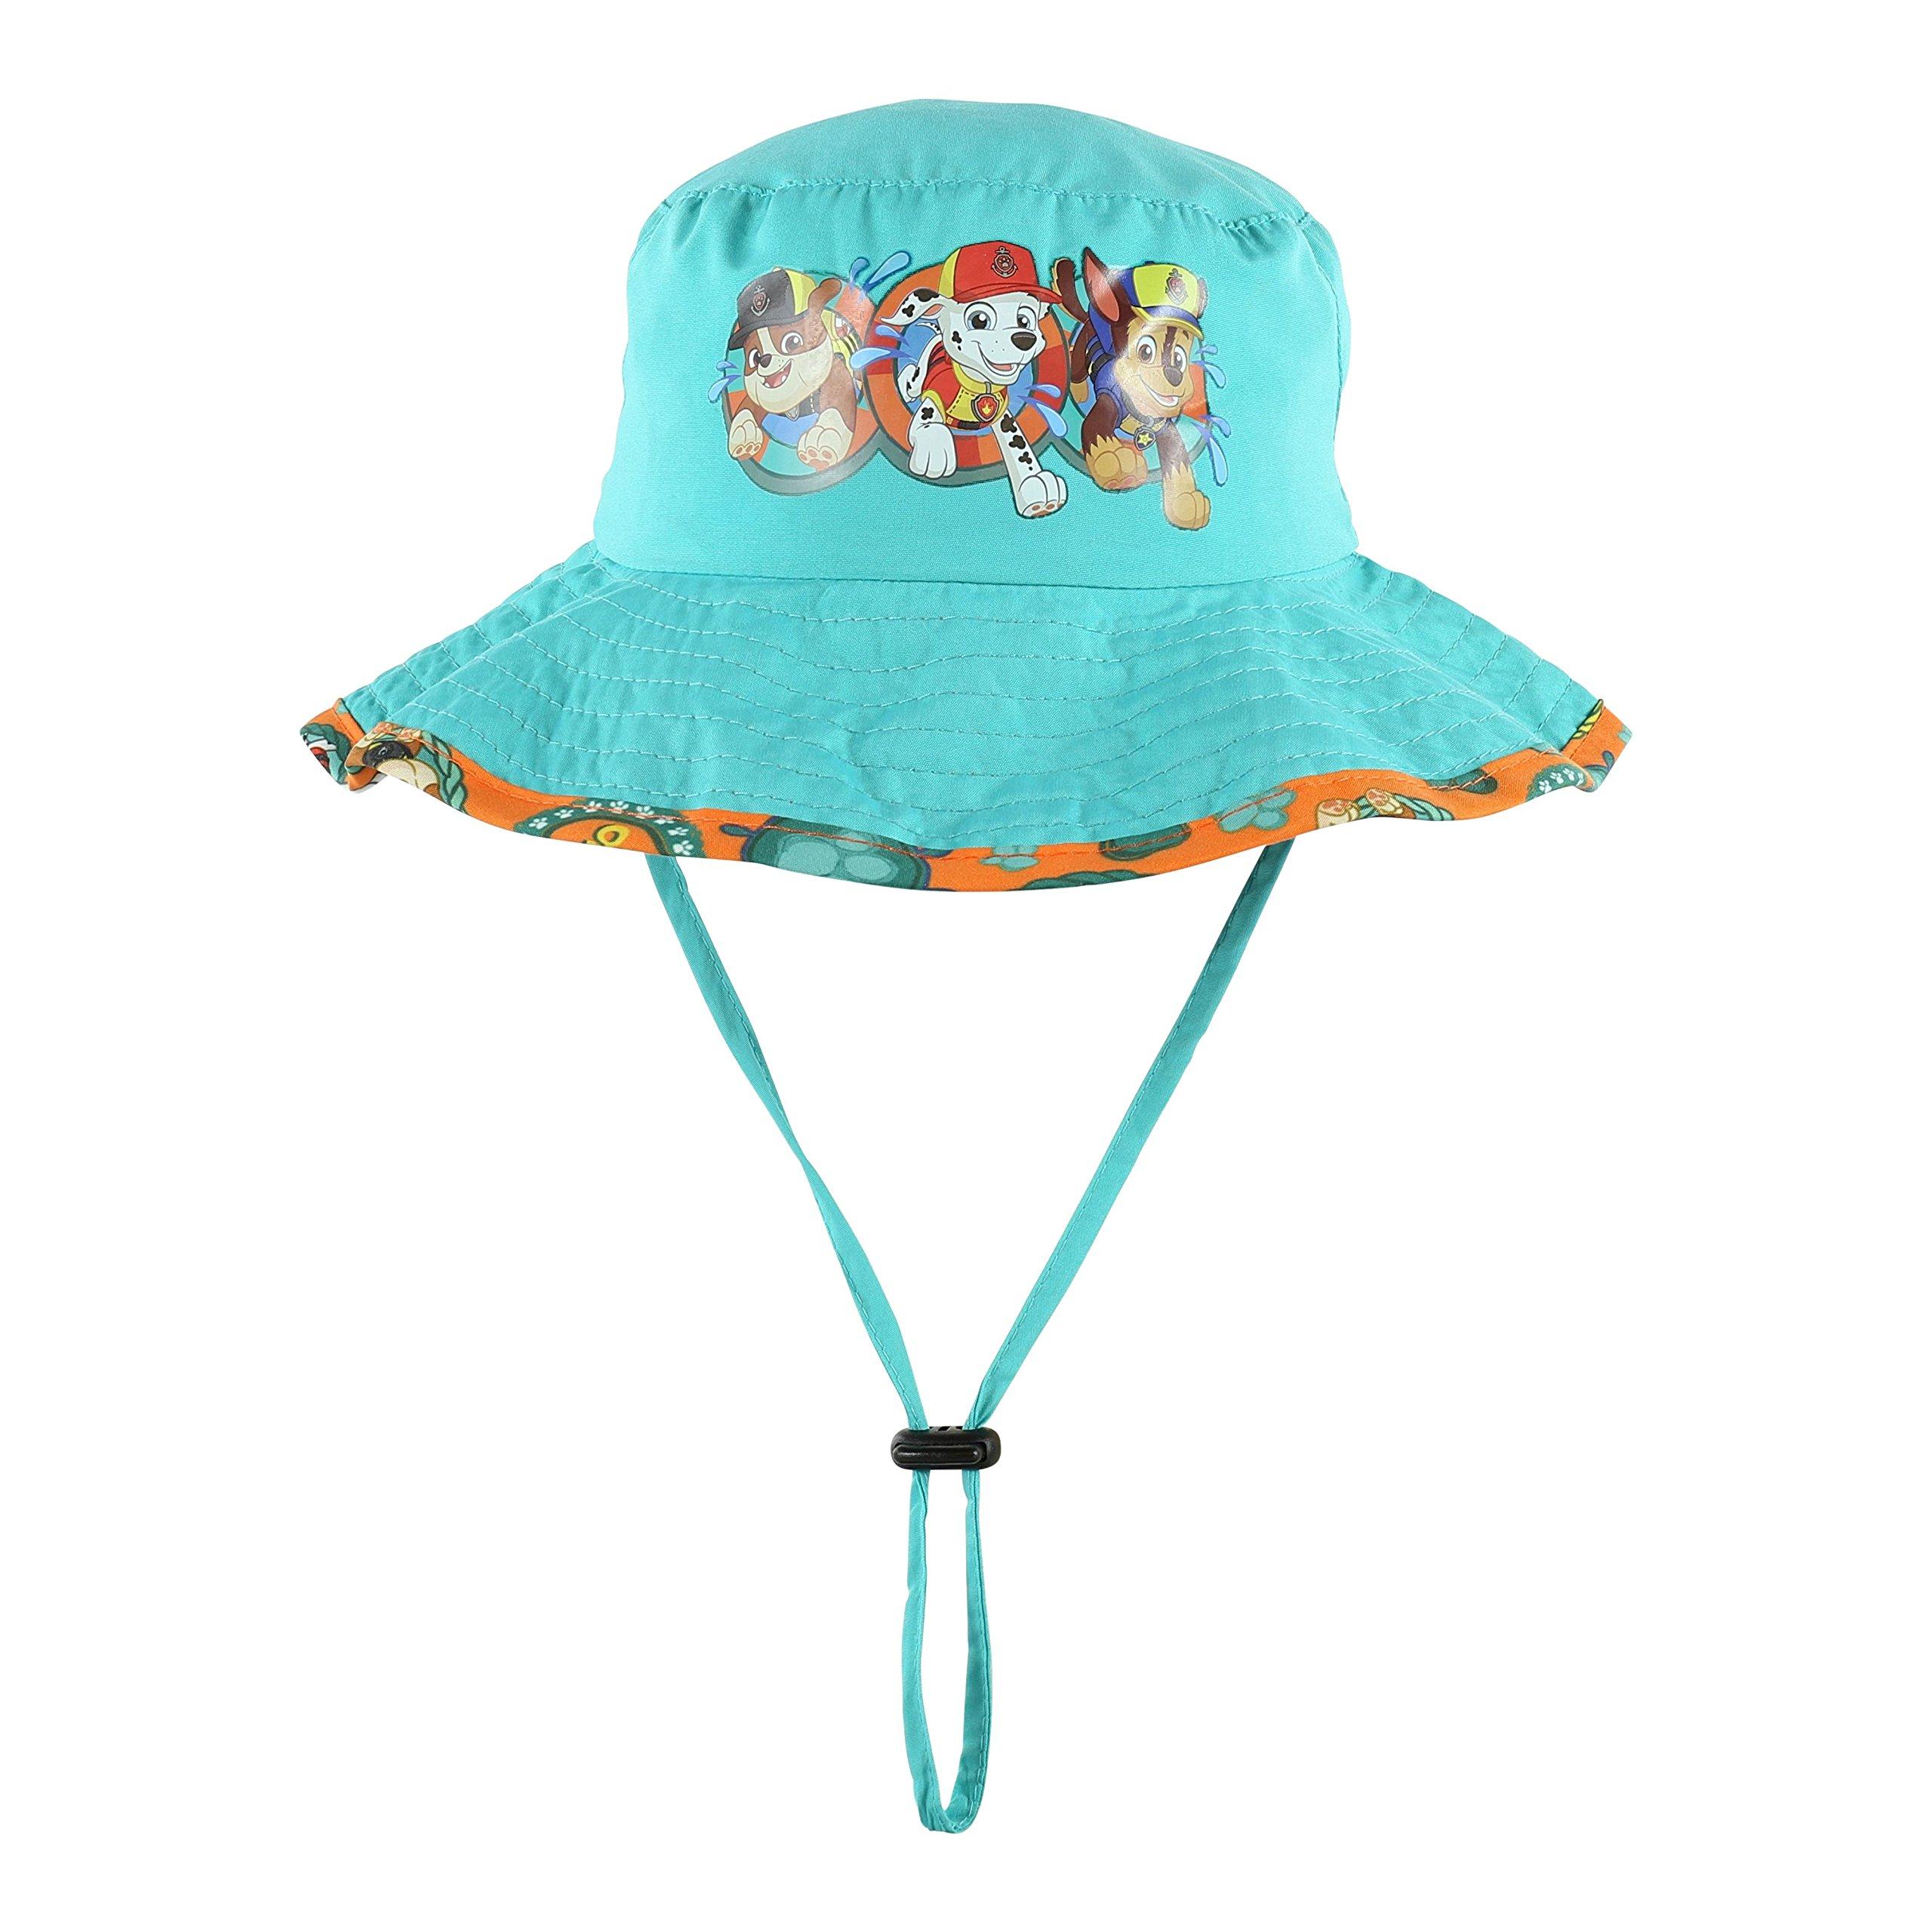 Nick JR Paw Patrol Boys Sun Boonie Hat - 100% Cotton